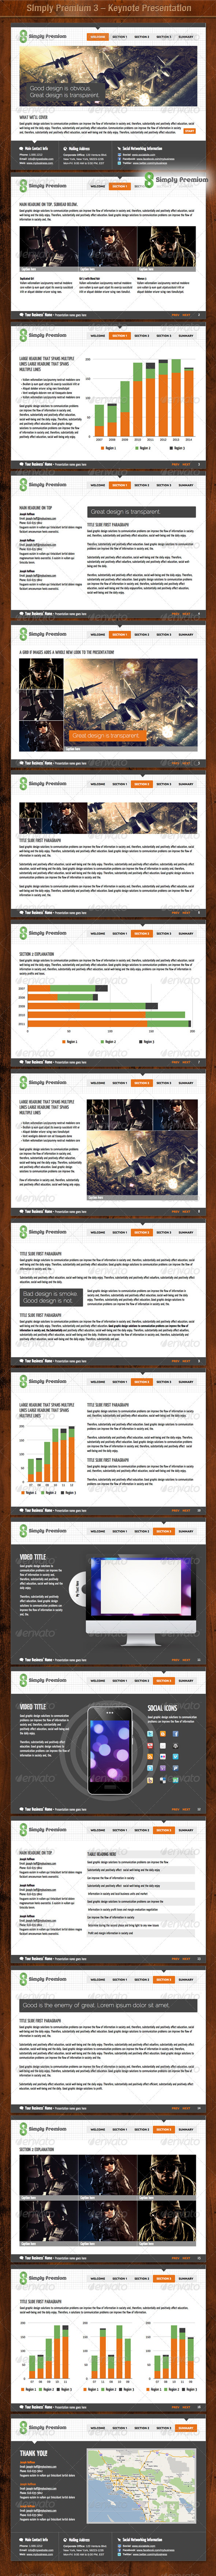 Simply Premium 3 – Keynote Presentation - Business Keynote Templates